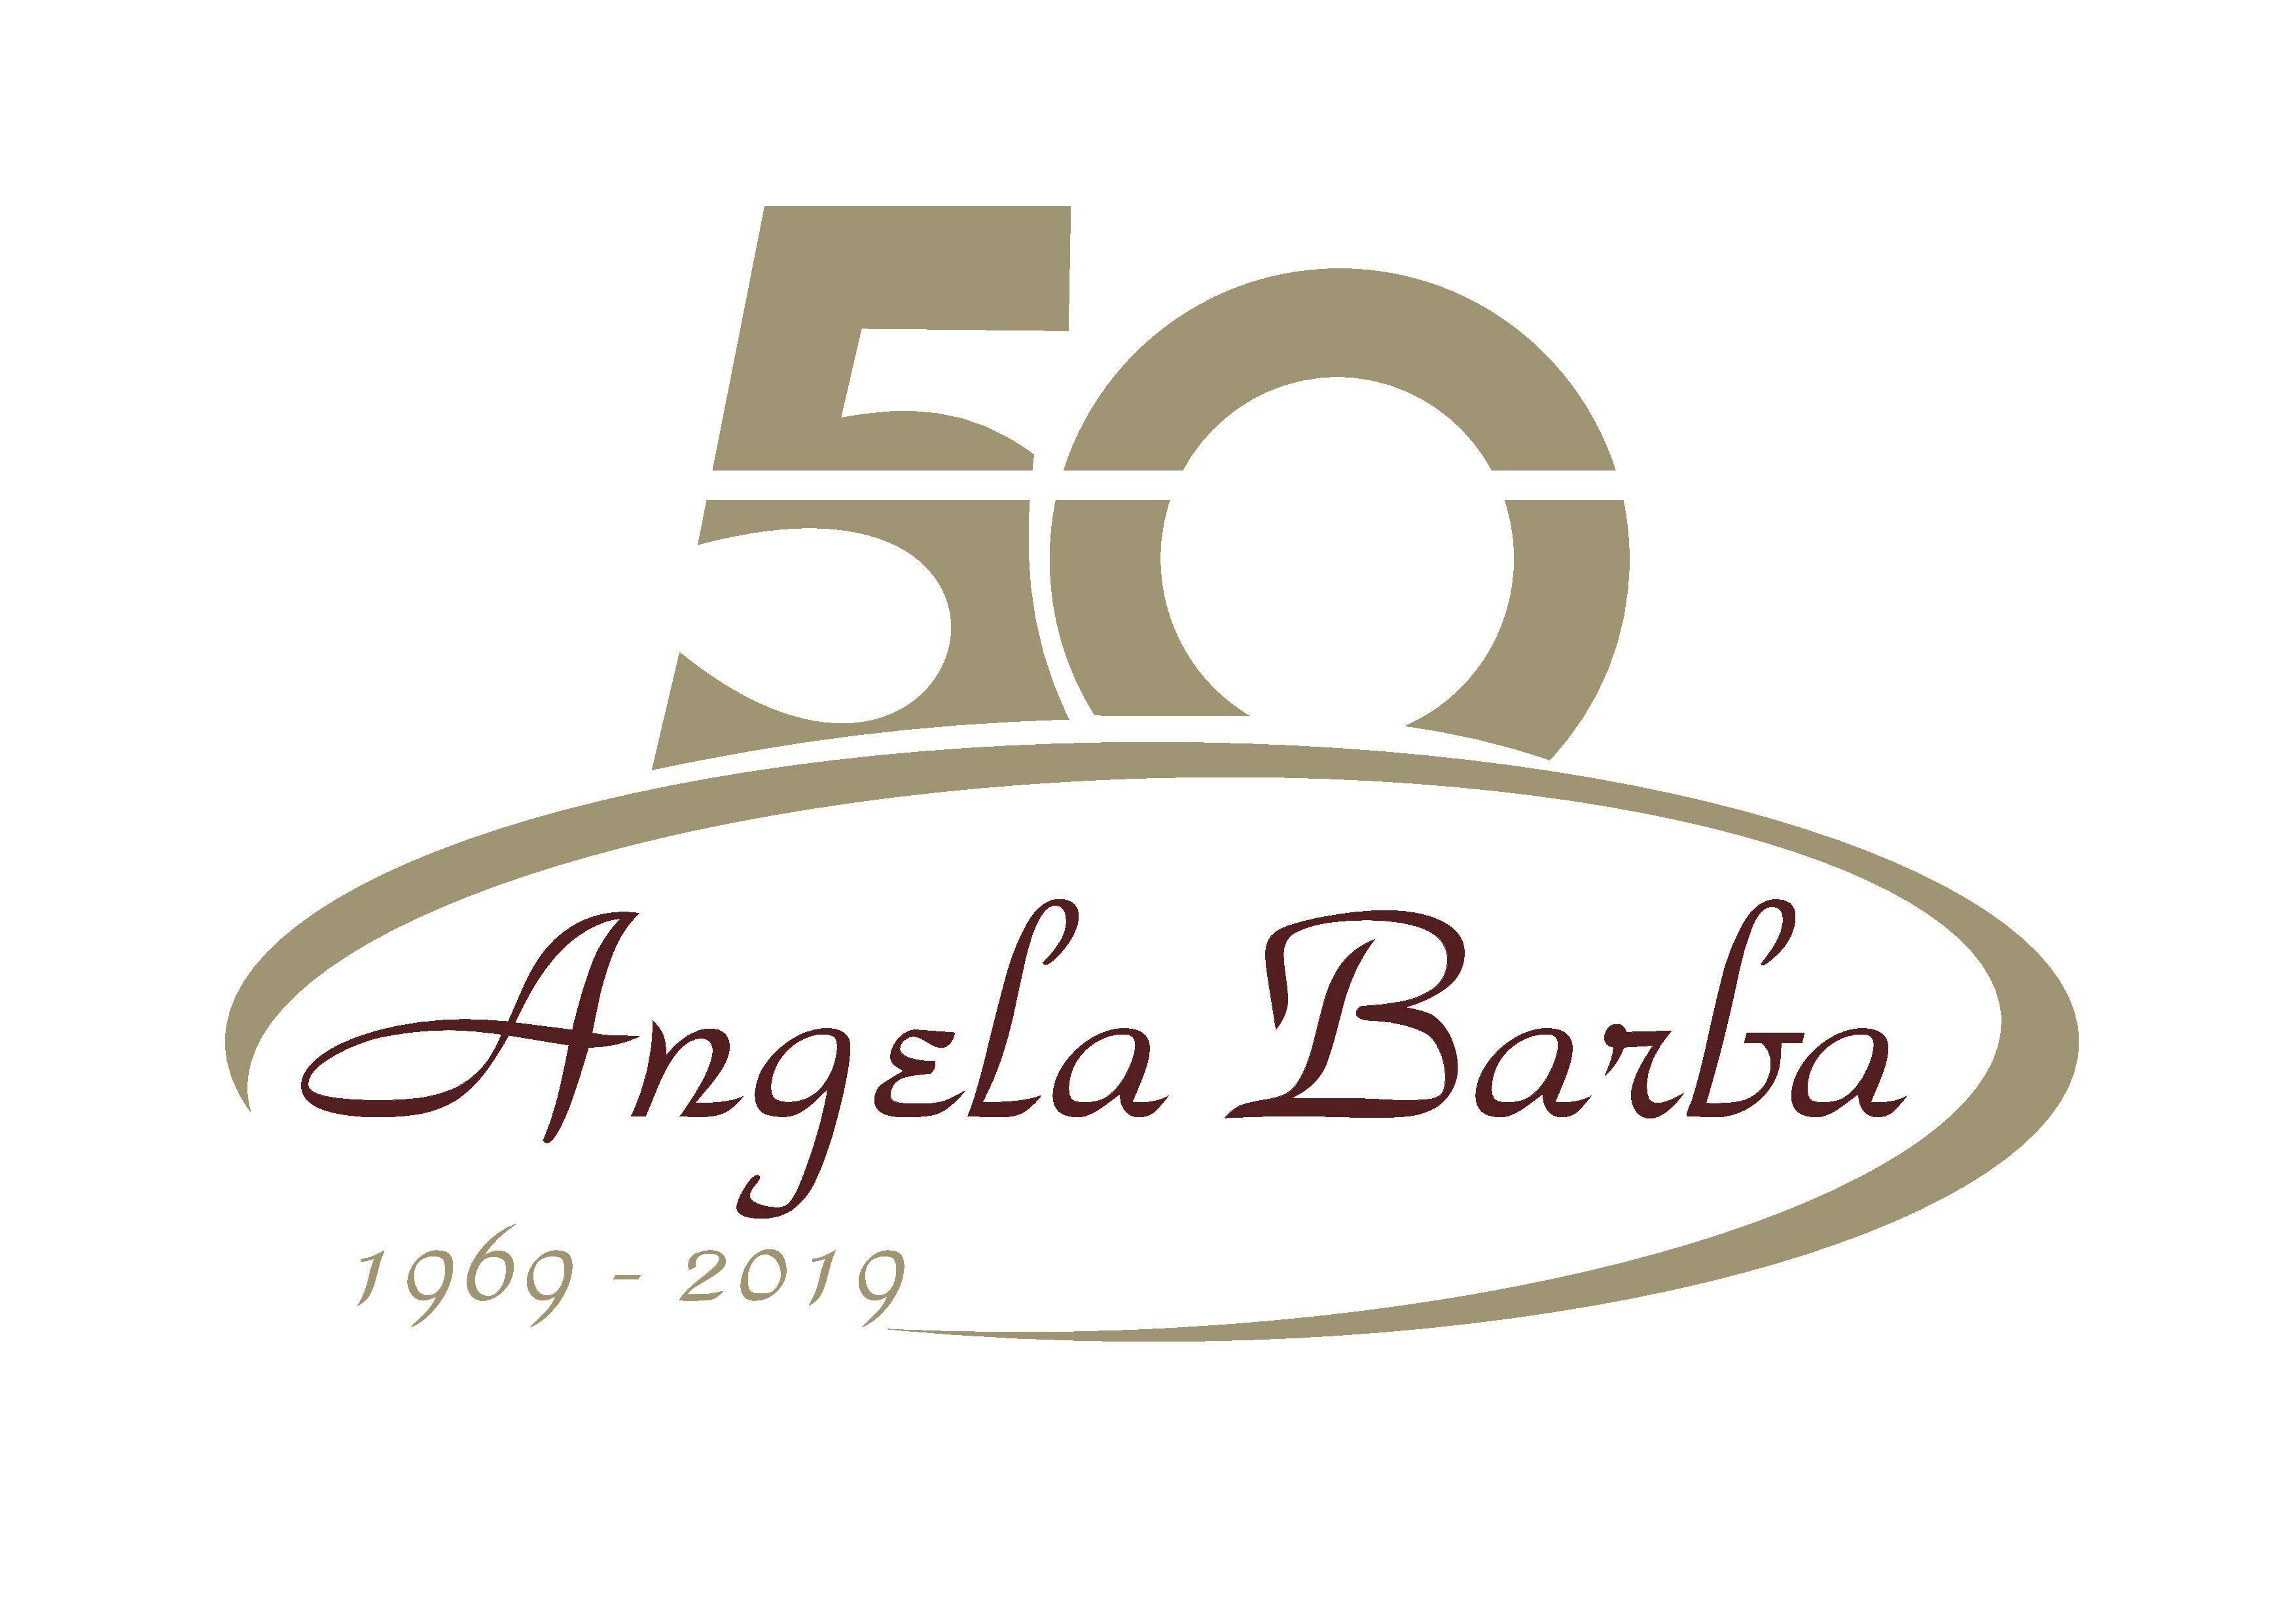 Angela Barba